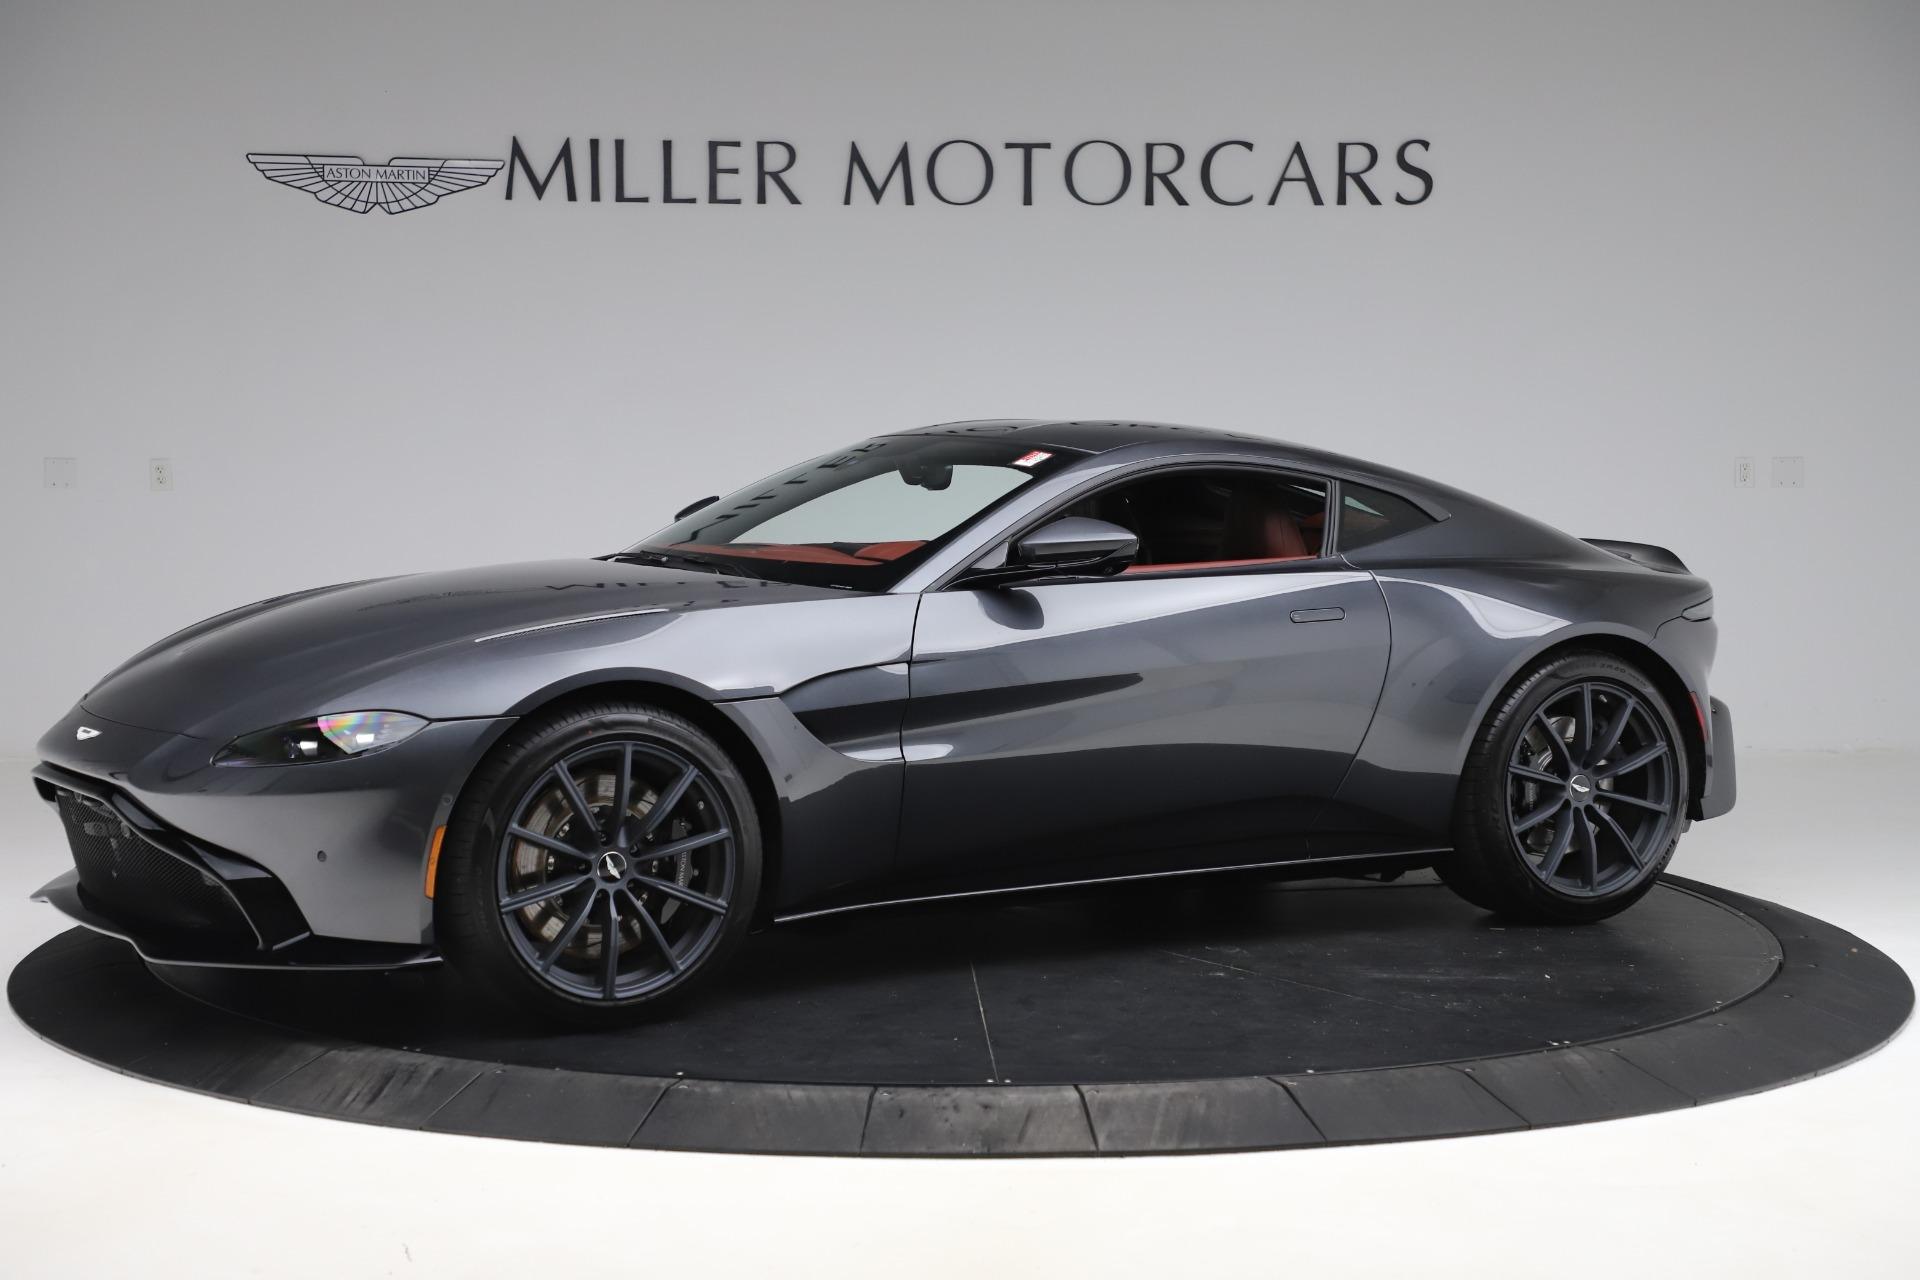 Used 2020 Aston Martin Vantage for sale $153,900 at Alfa Romeo of Westport in Westport CT 06880 1